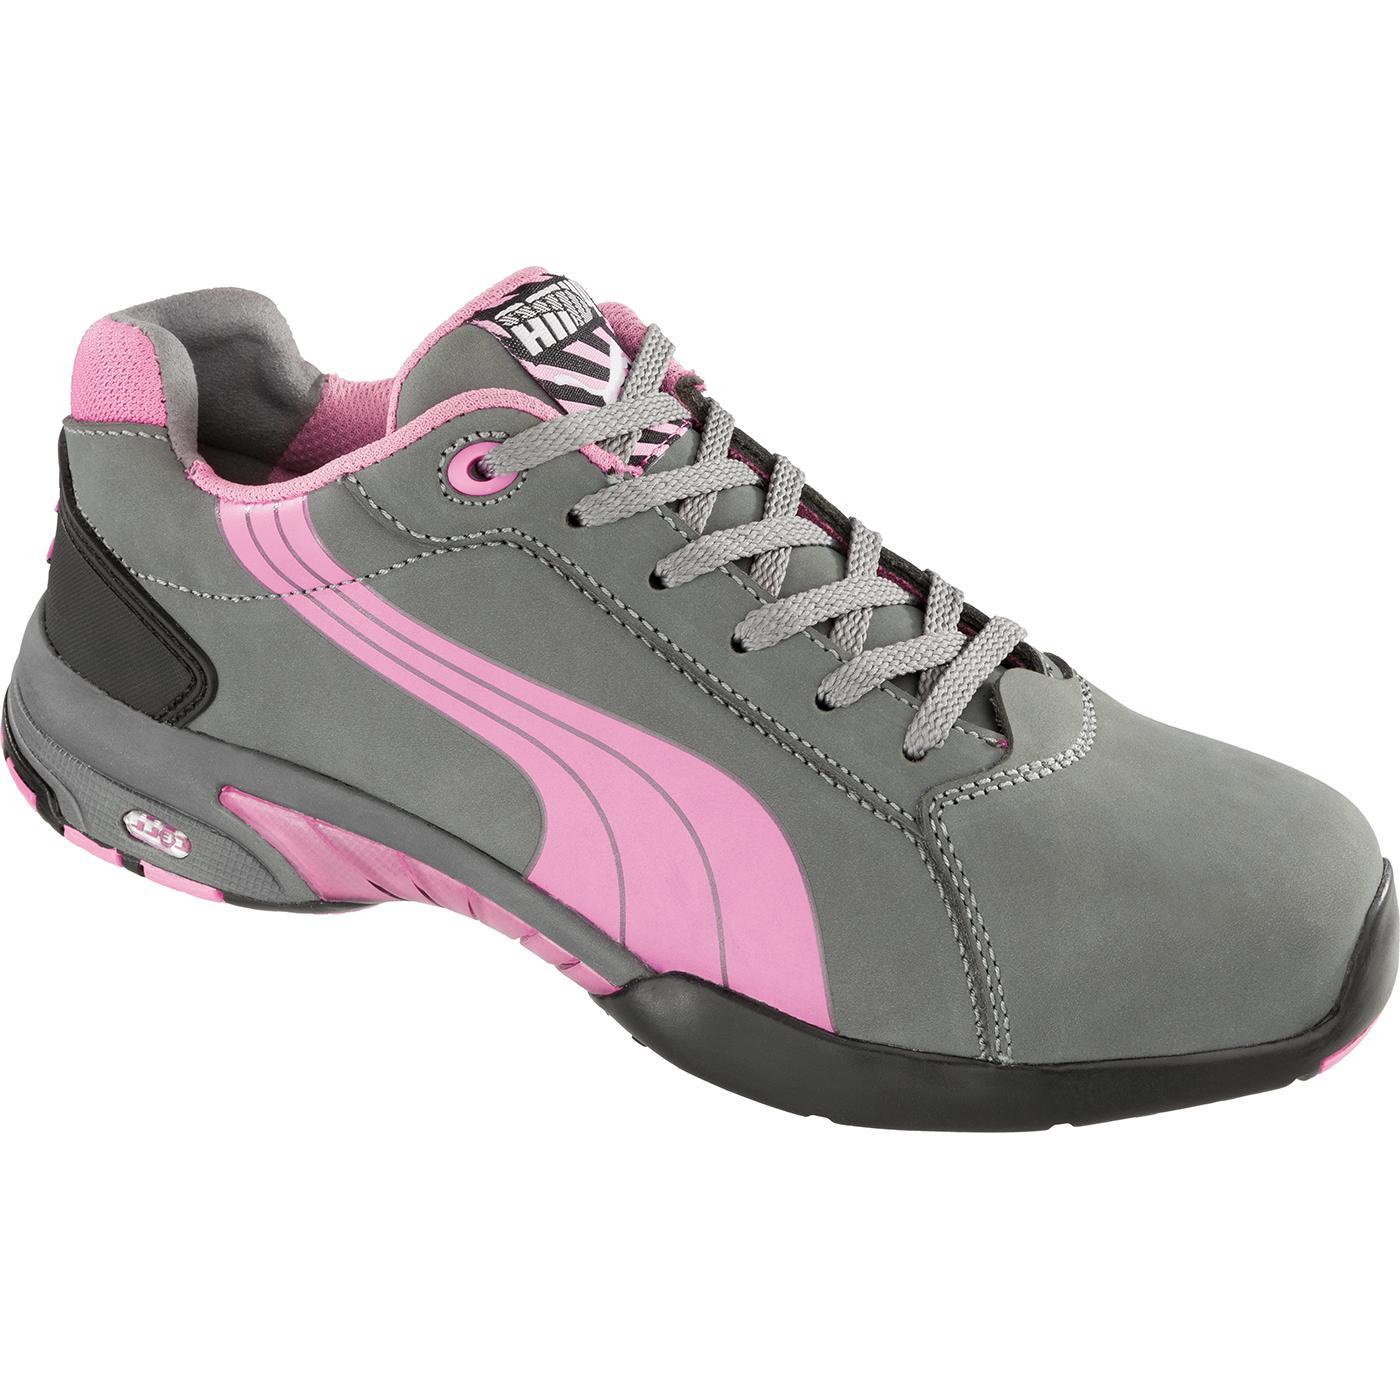 Puma Womenu0026#39;s Steel Toe Static-Dissipative Work Sneakers